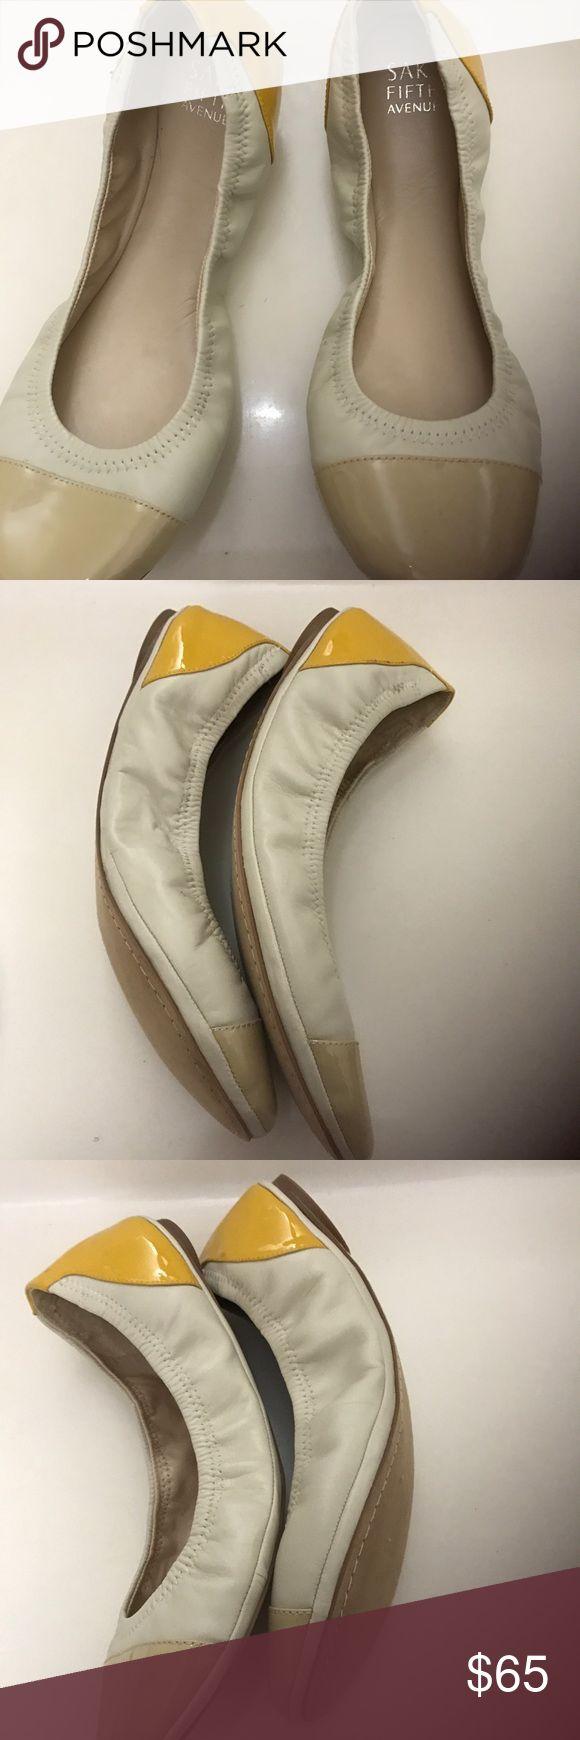 ⚡️FLASH SALE ⚡️Saks Fifth Avenue Ballet Flats NWOT ⚡️FLASH SALE⚡️Saks Fifth Avenue Ballet Flats NWOT            Size:9.5 Saks Fifth Avenue Shoes Flats & Loafers